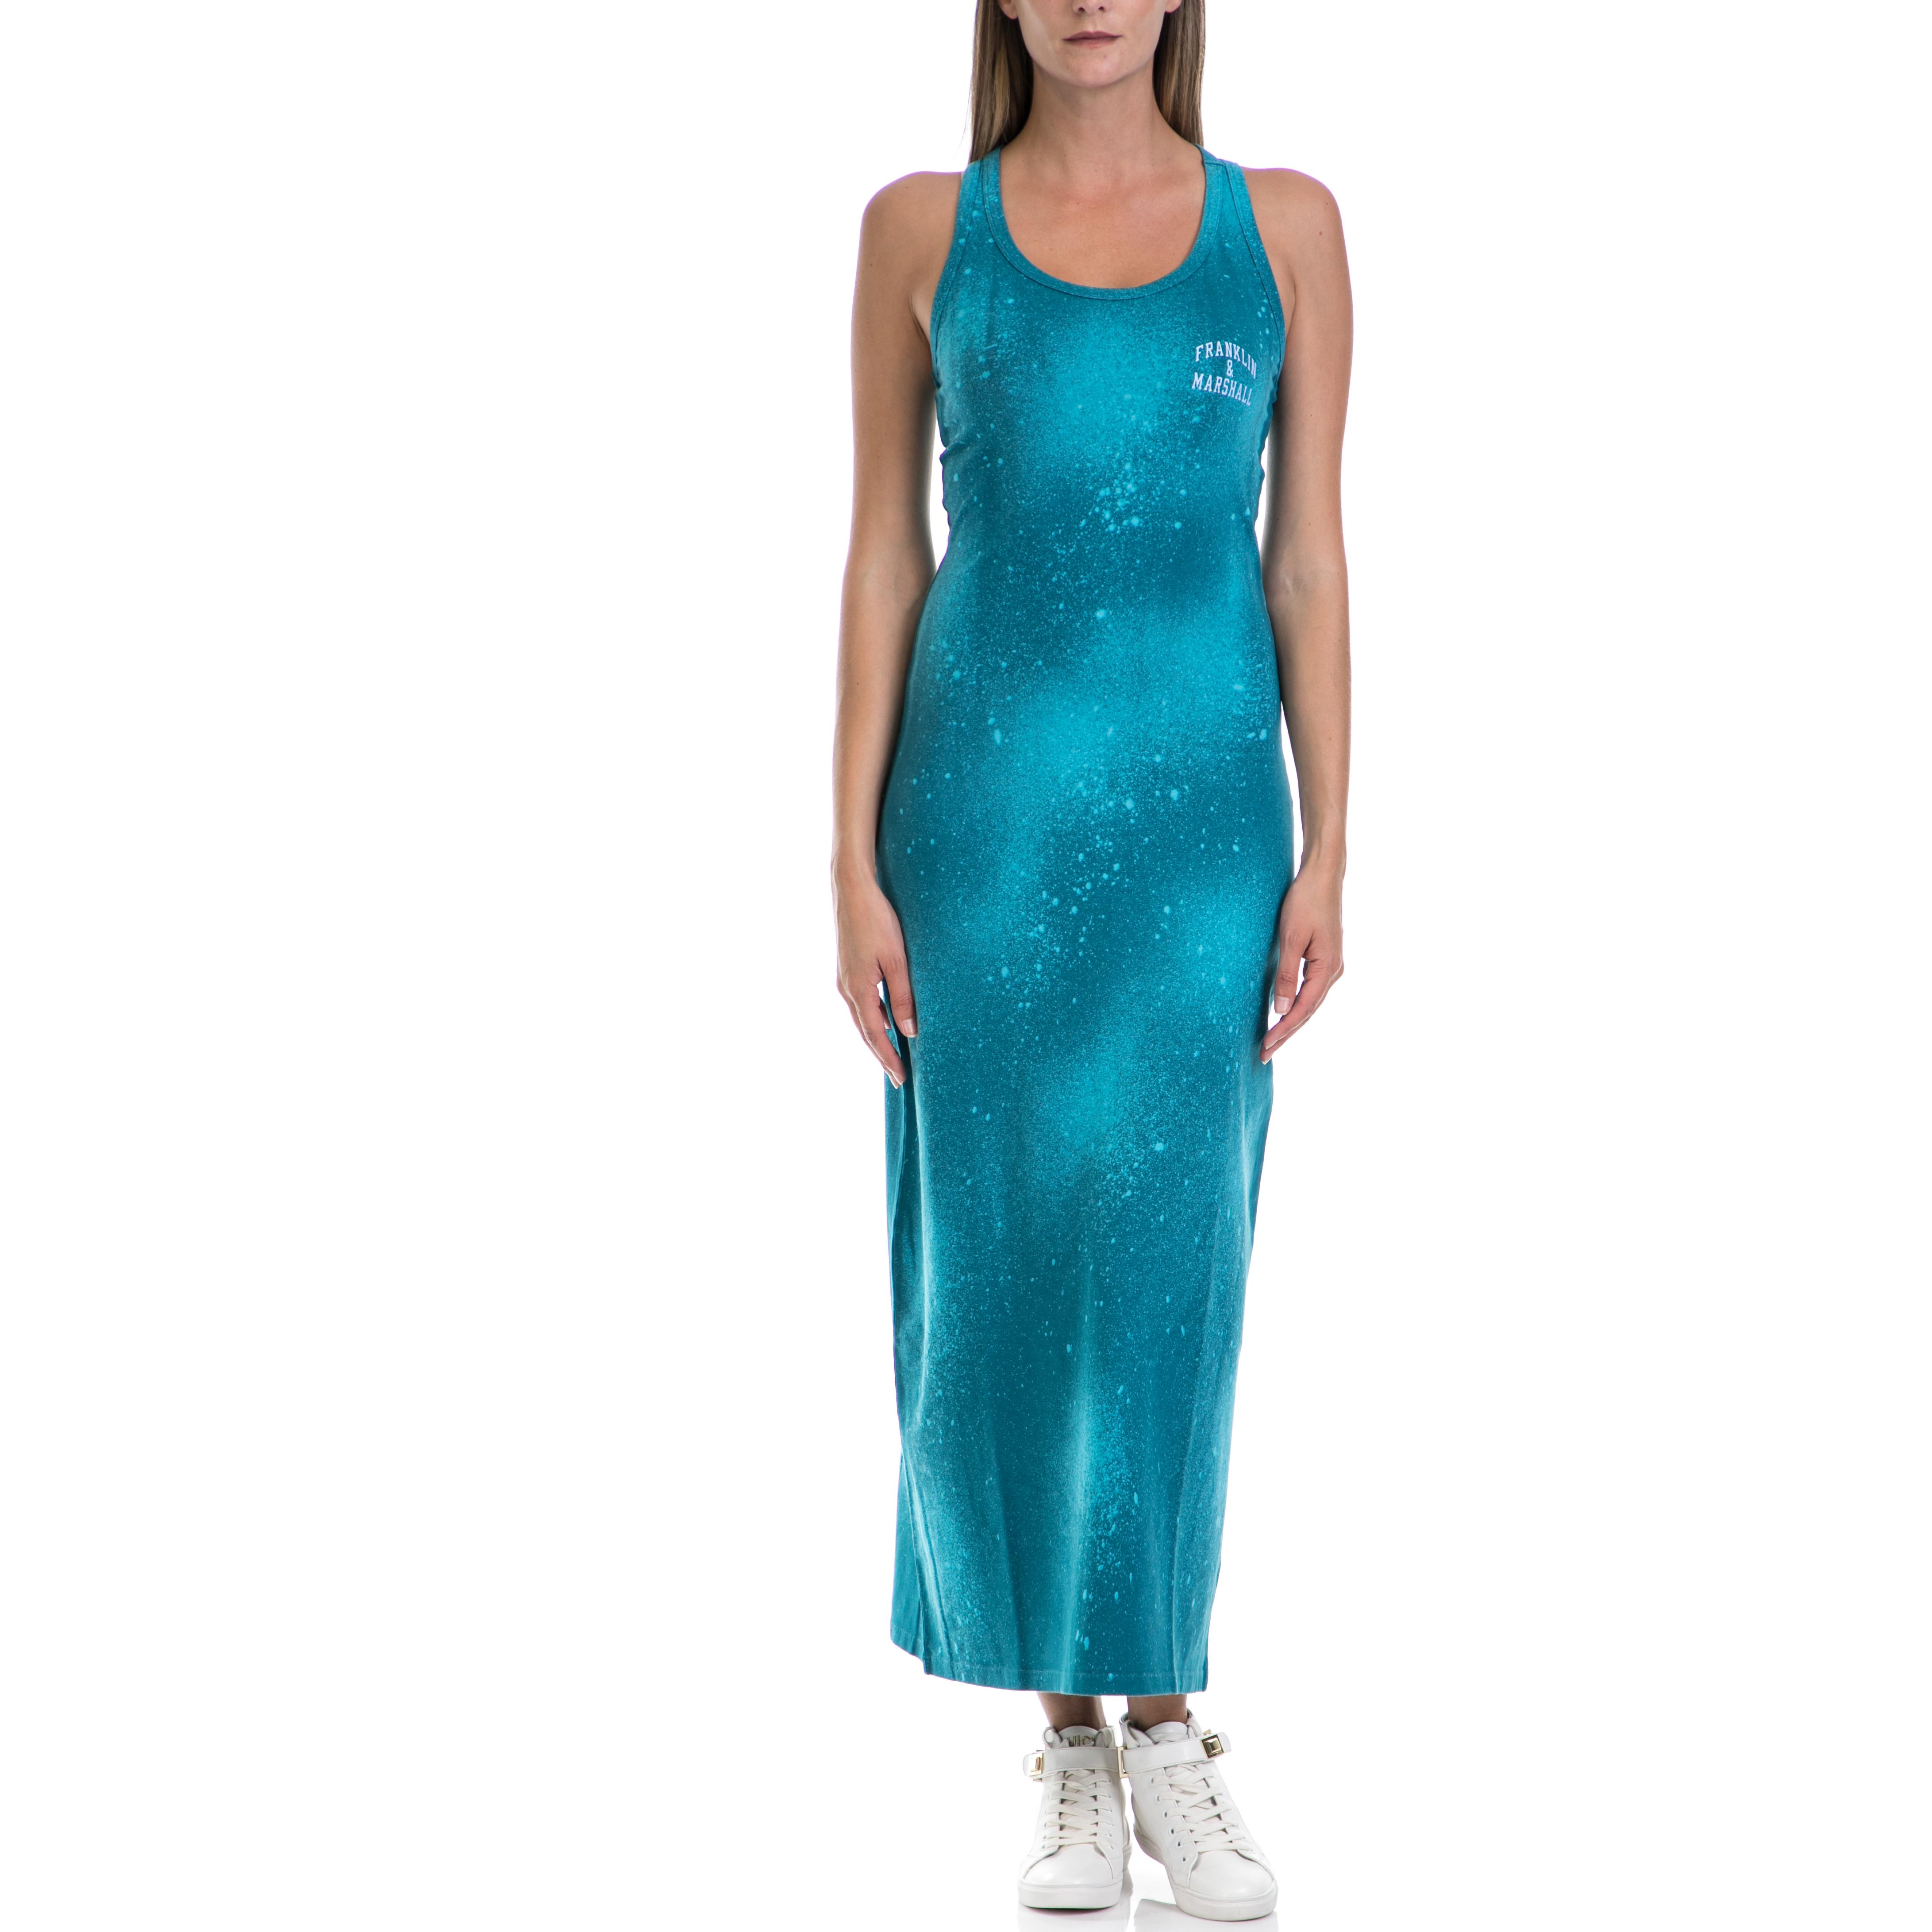 f00ff14ffe91 FRANKLIN   MARSHALL - Γυναικείο φόρεμα Franklin   Marshall μπλε-πράσινο